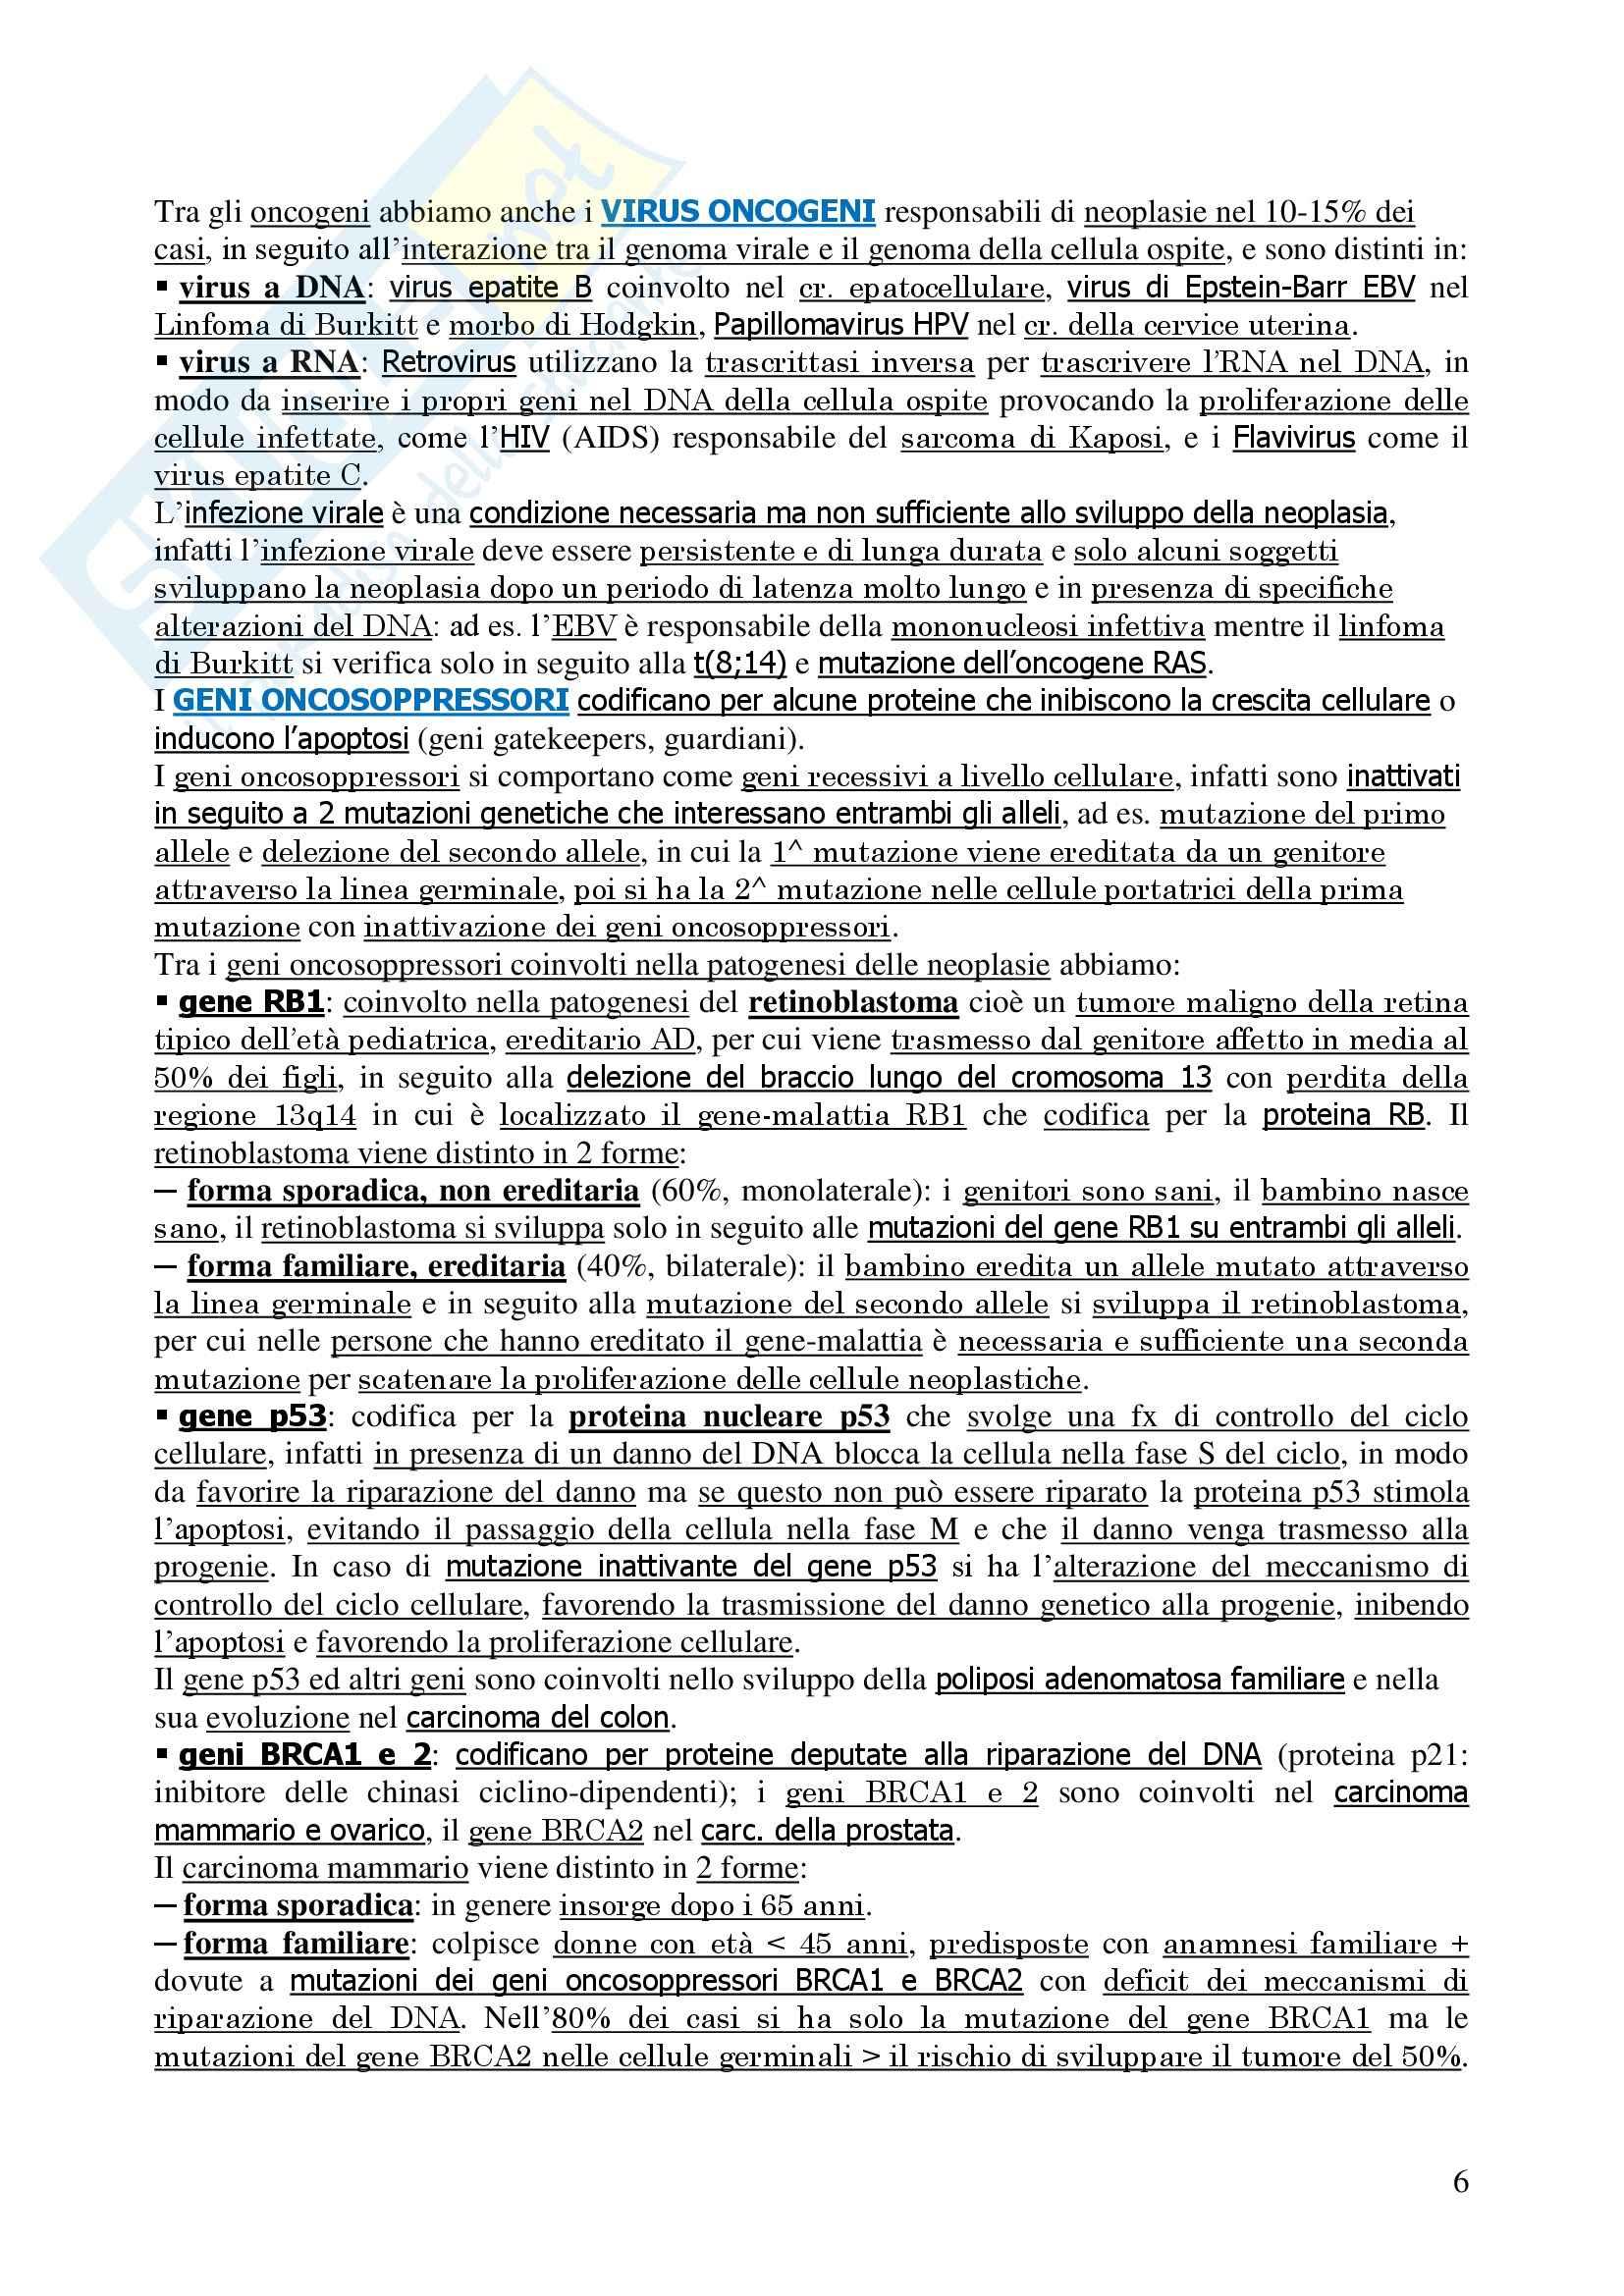 Oncologia Clinica - Dispensa Oncologia Medica-Clinica Pag. 6